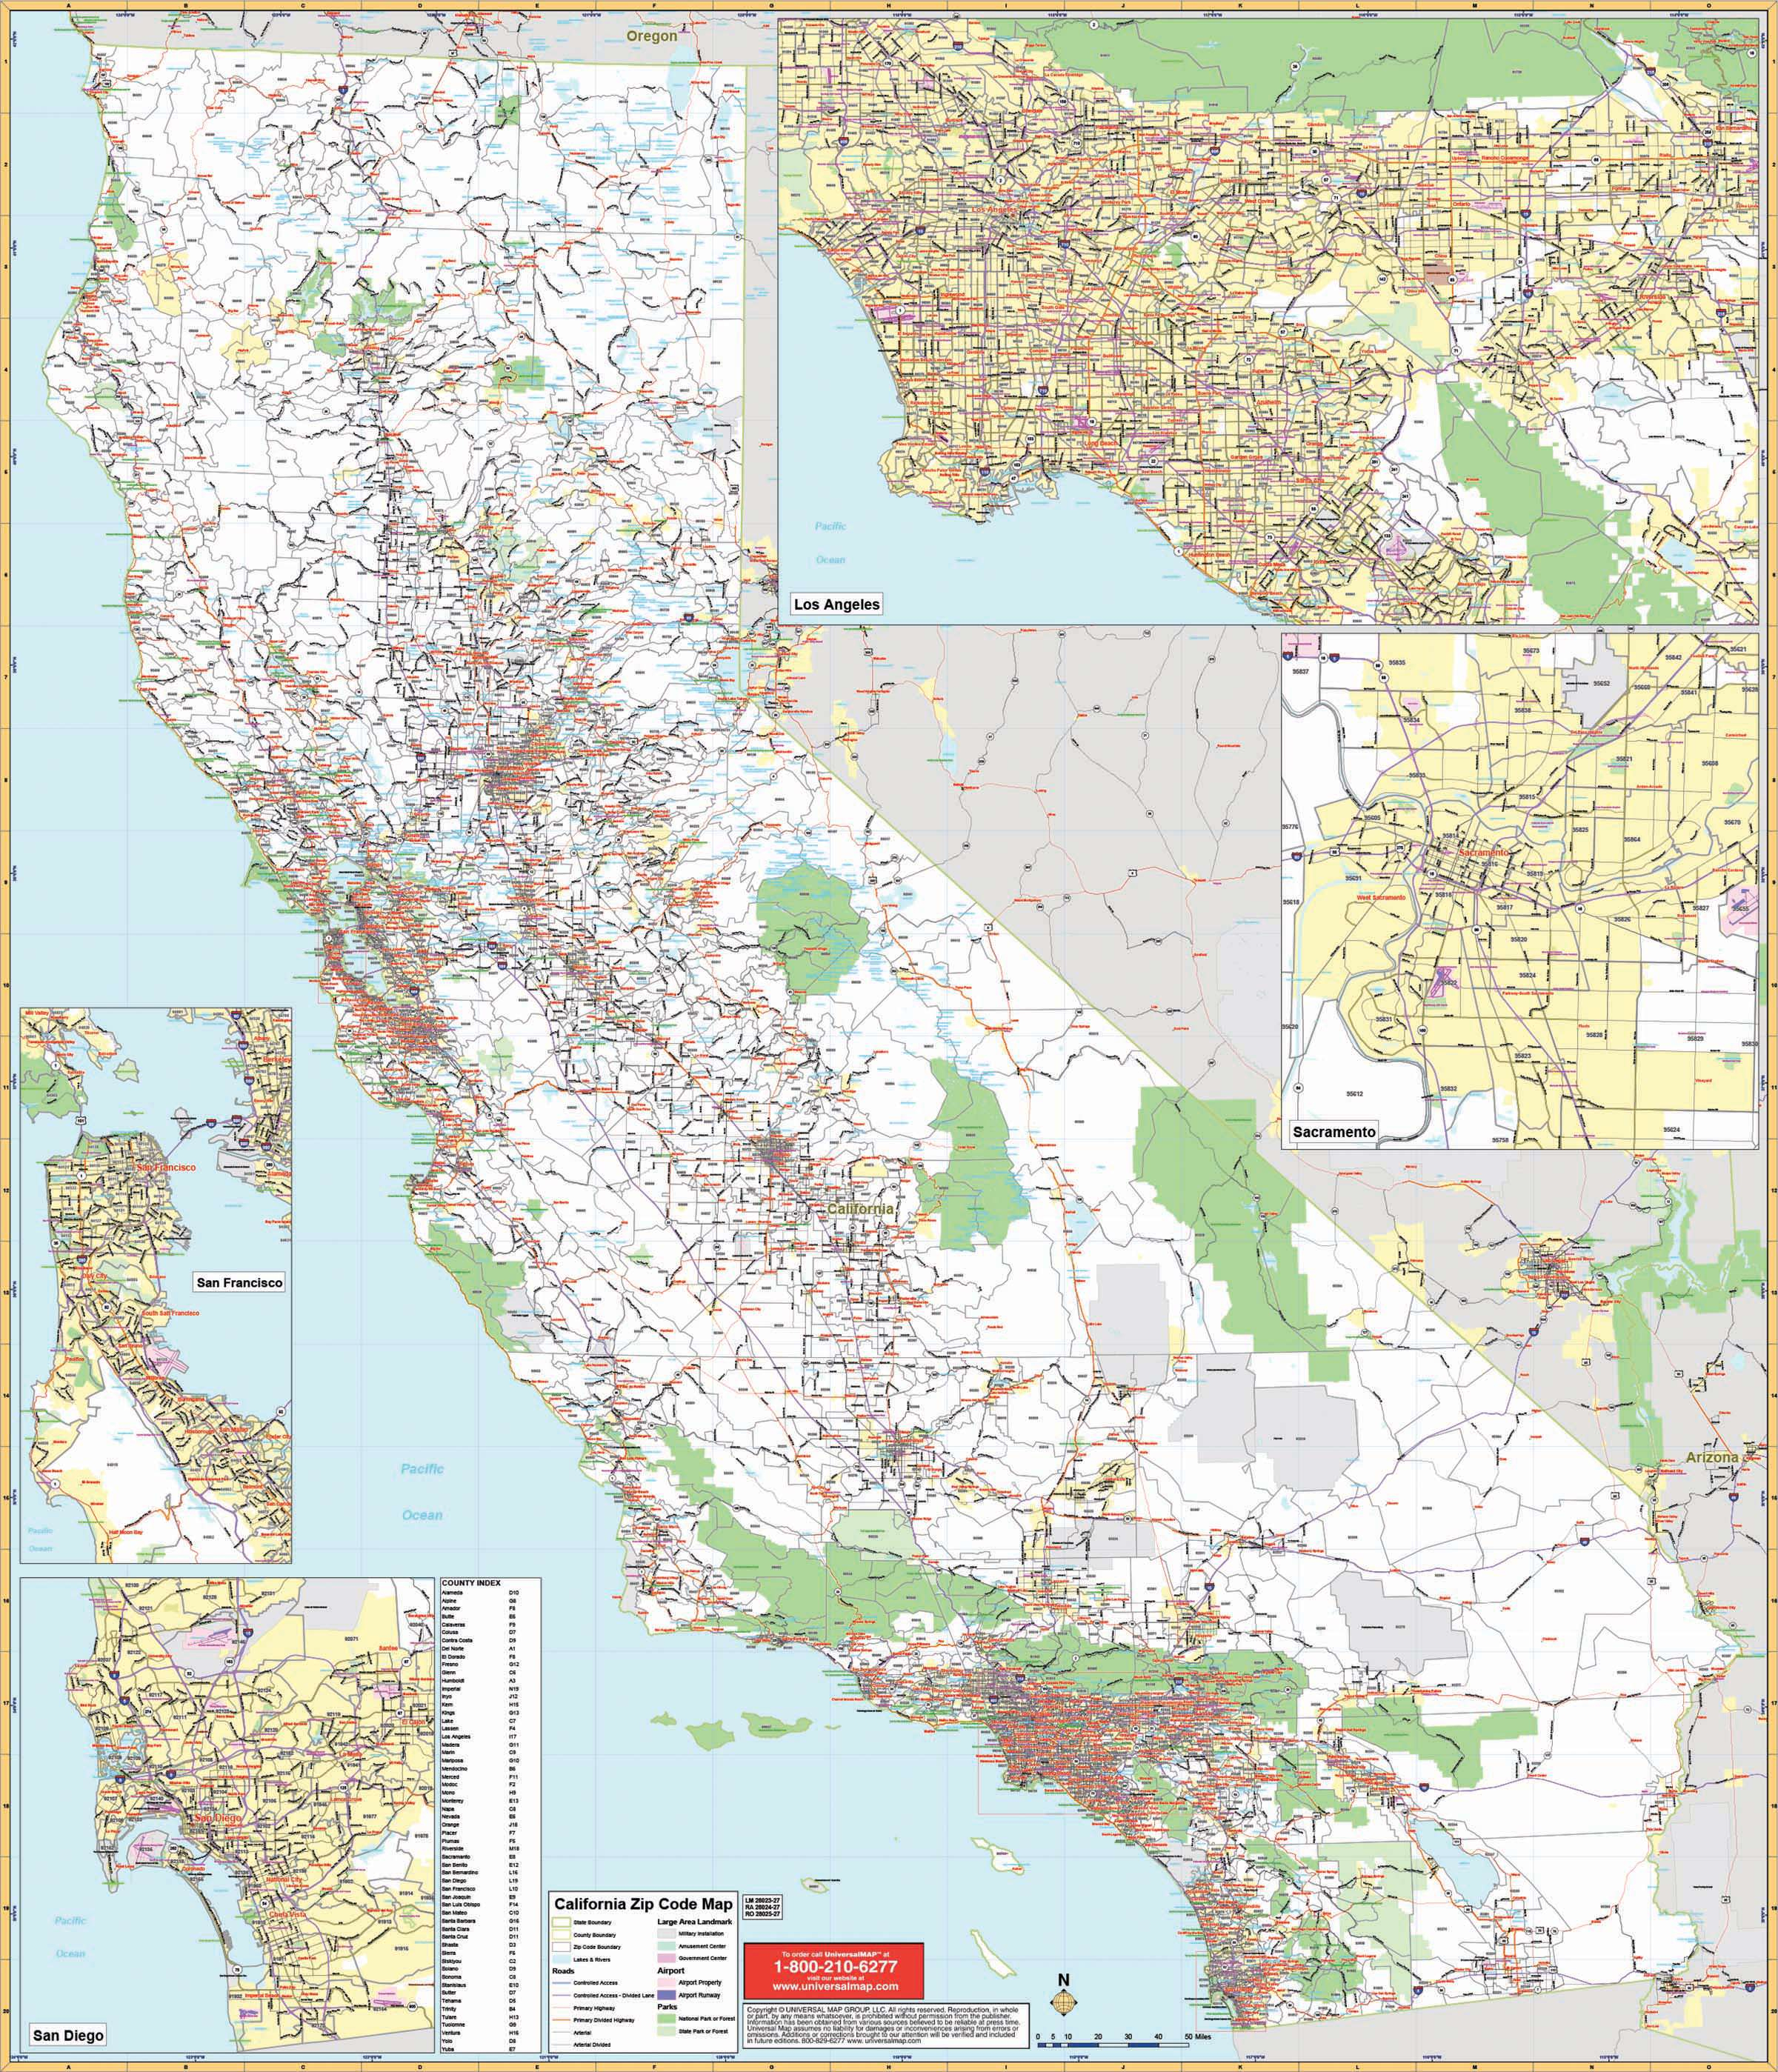 California State Wall Map W/ Zip Codes – Kappa Map Group - California Wall Map